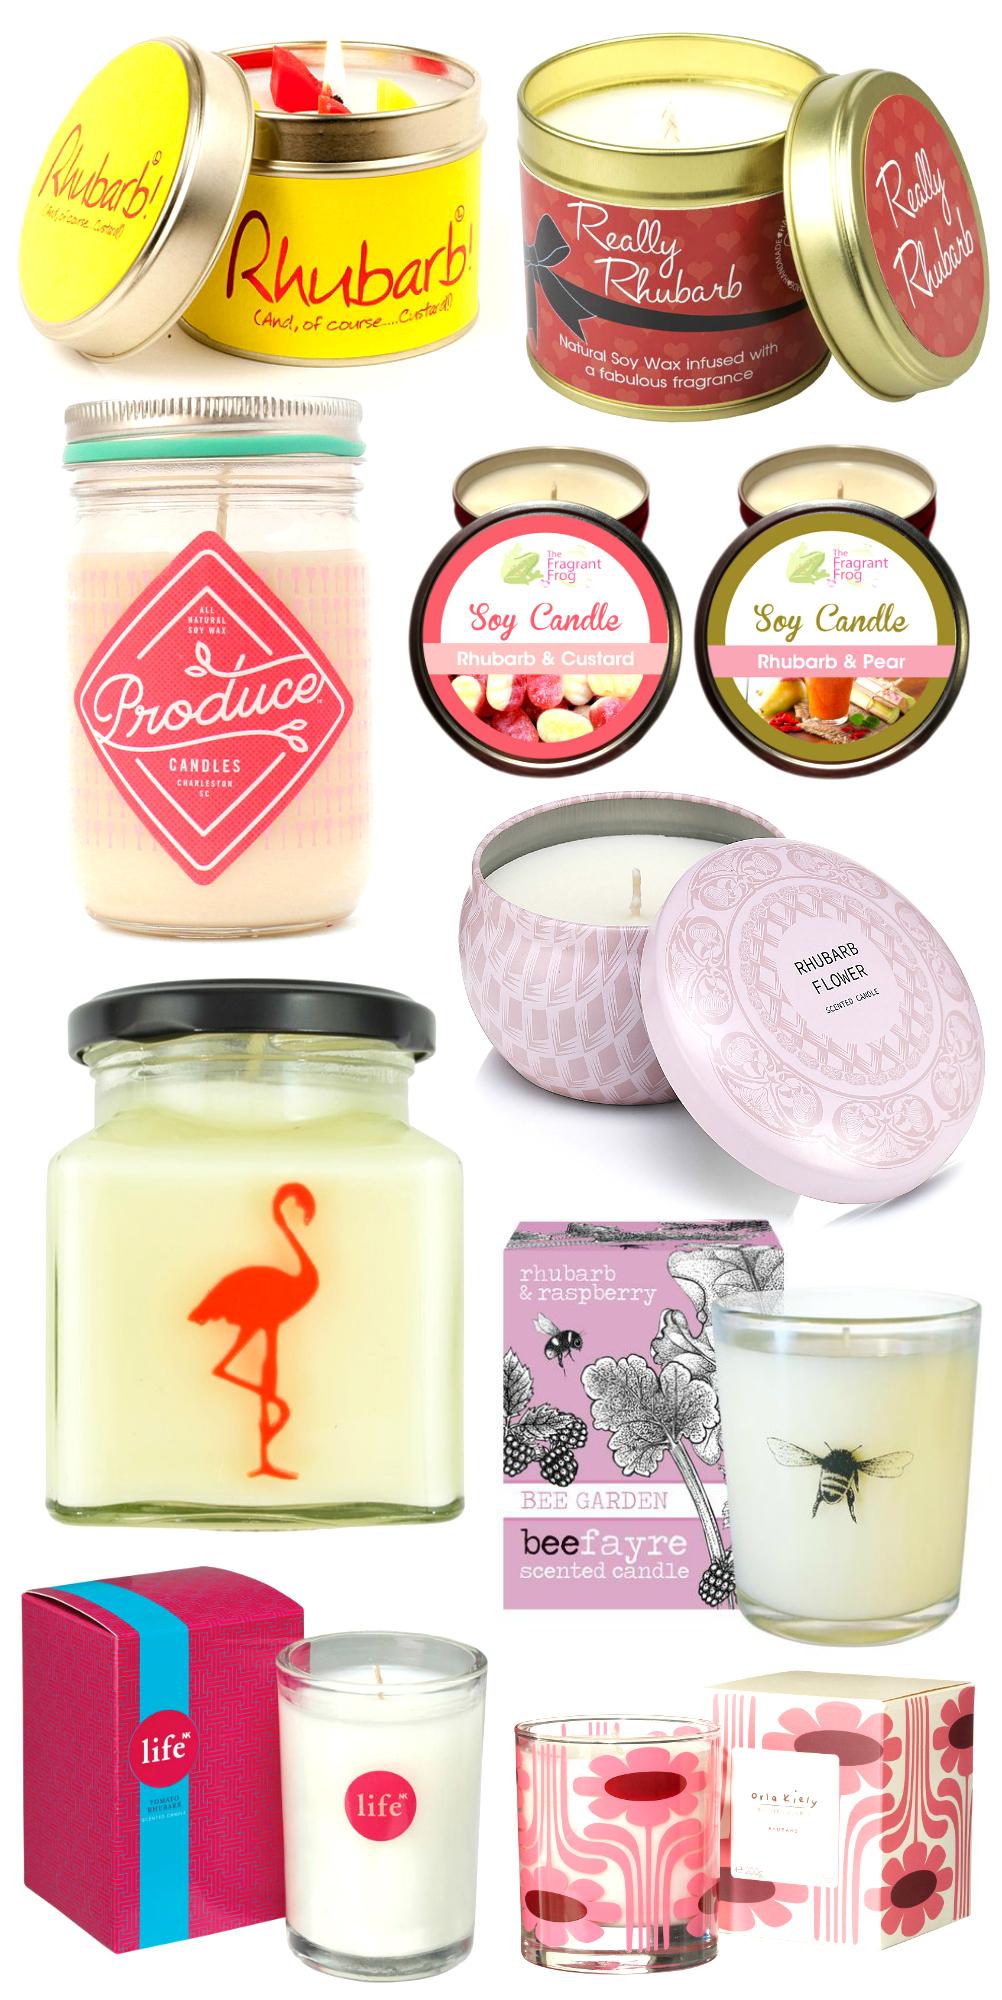 Rhubarb Candles